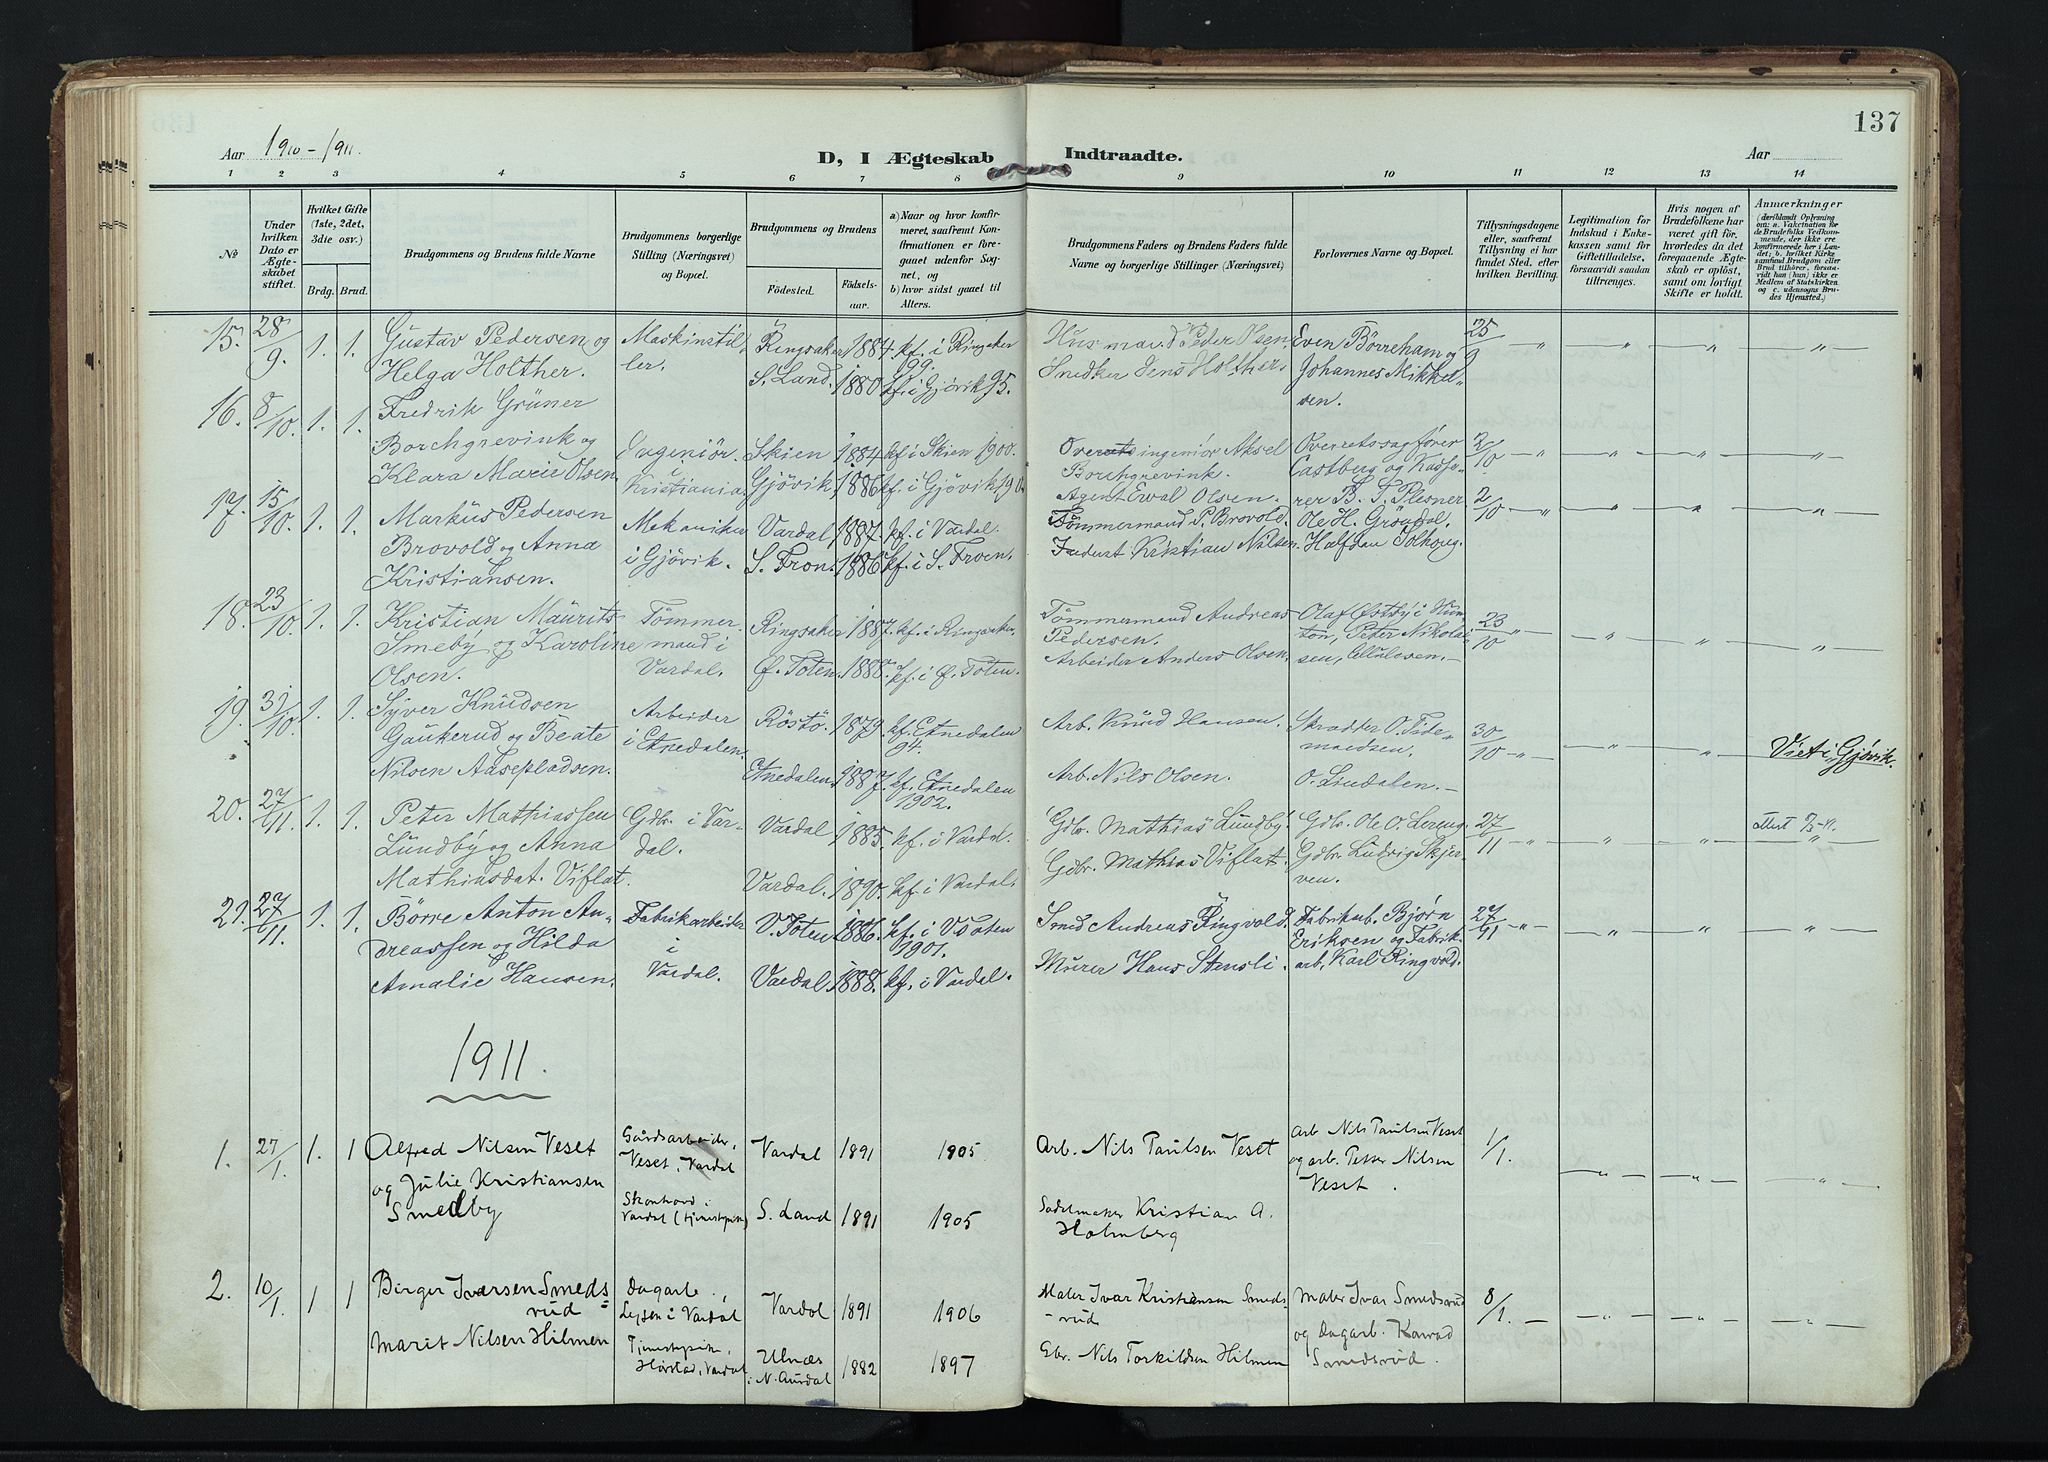 SAH, Vardal prestekontor, H/Ha/Haa/L0020: Ministerialbok nr. 20, 1907-1921, s. 137